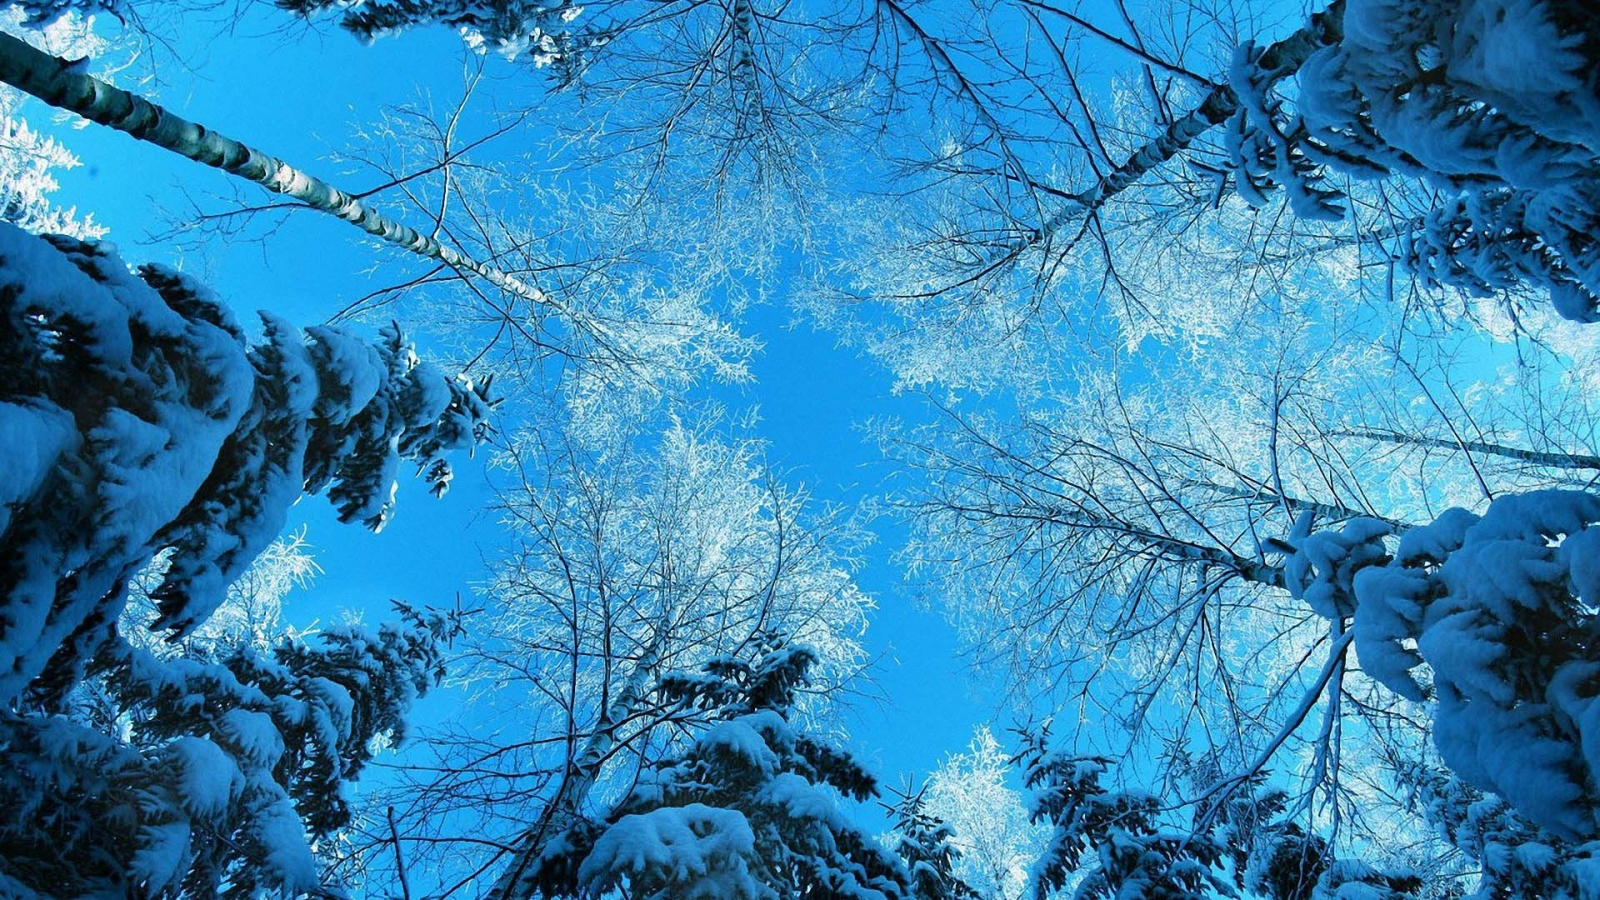 1600x900 hd desktop wallpaper winter -#main